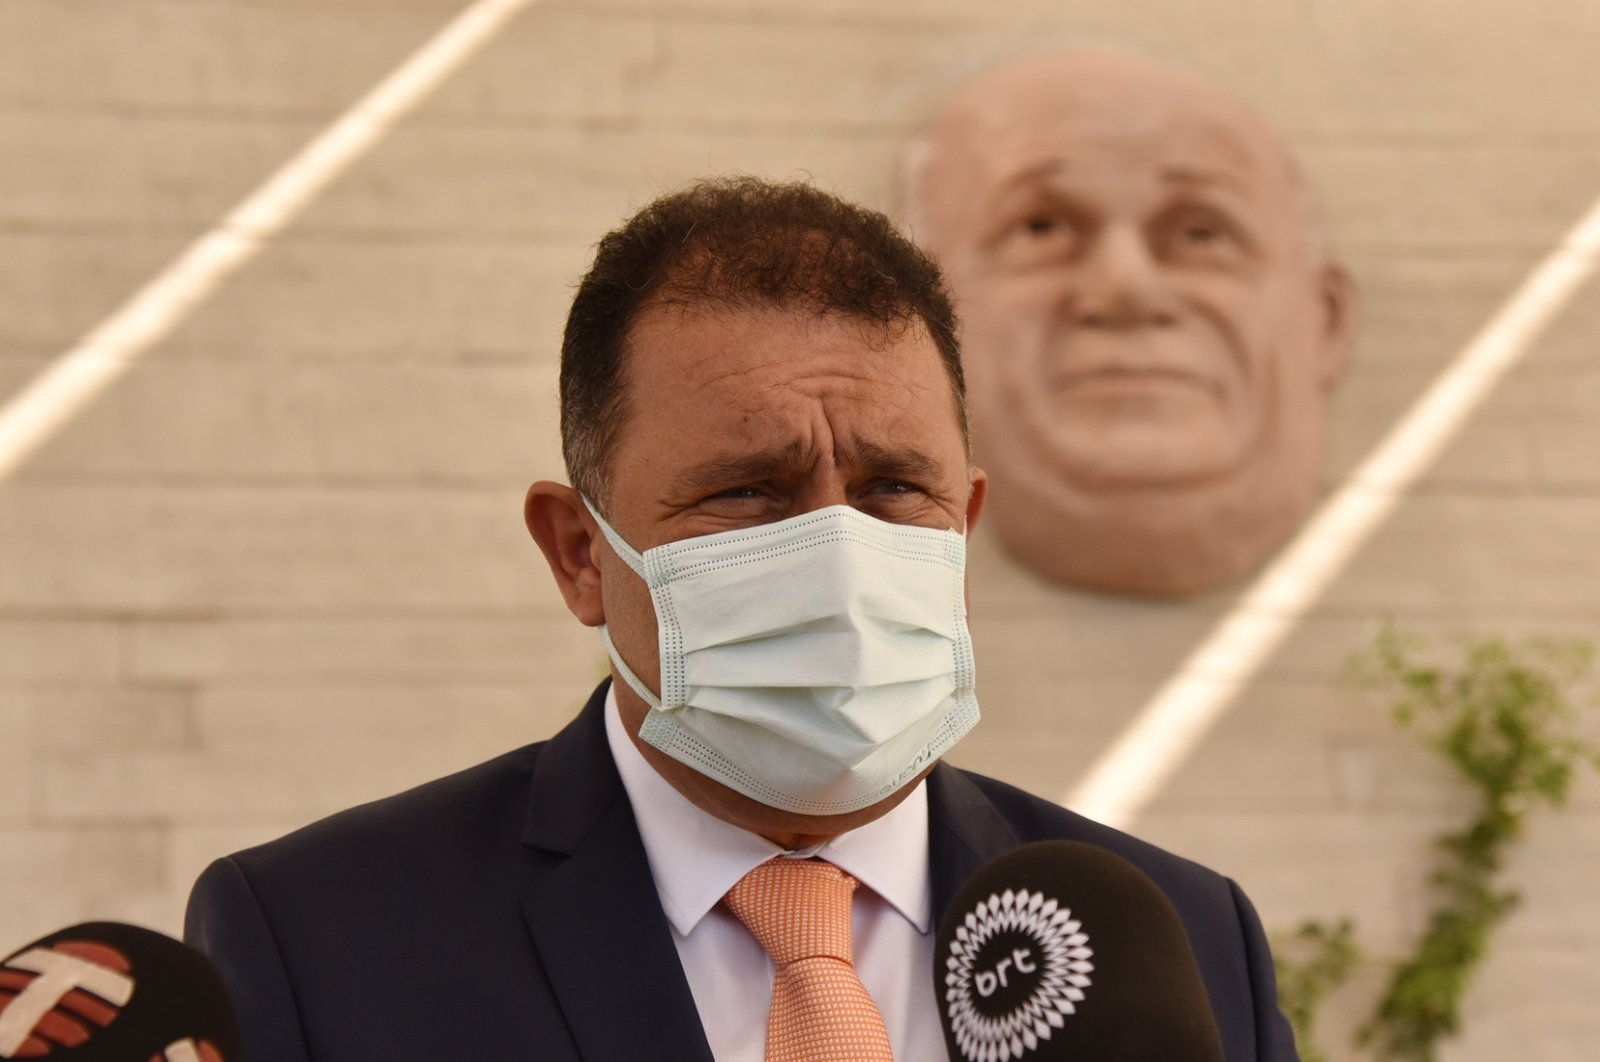 Turkish Cyprus' Prime Minister Ersan Saner in Lefkoşa (Nicosia), TRNC, Oct. 6, 2021. (AA Photo)